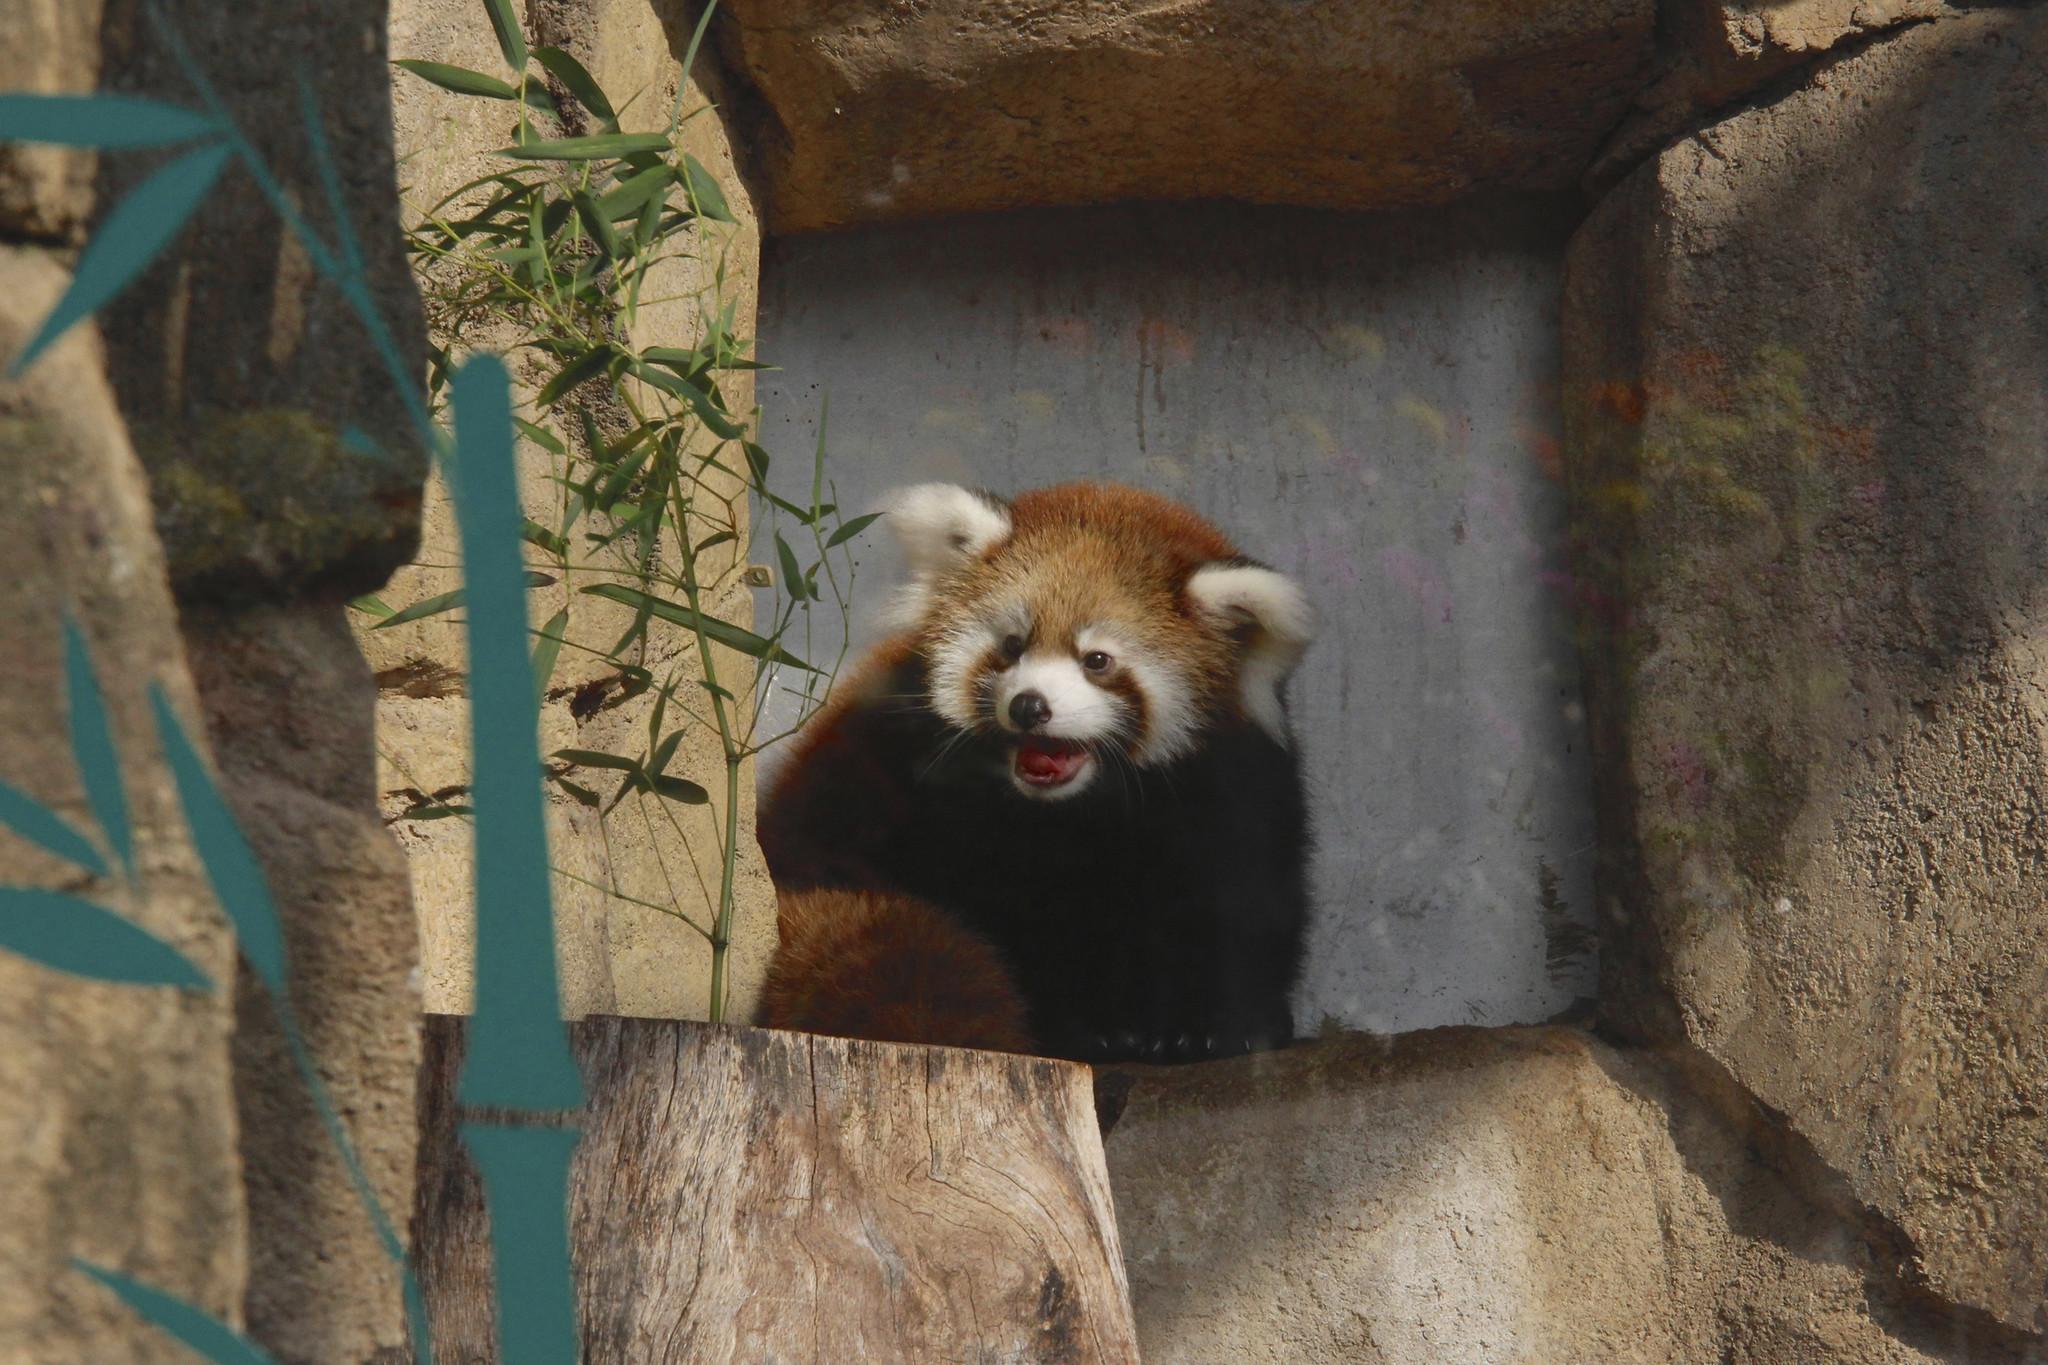 SEE IT: Baby red panda Kiki makes adorable debut at Milwaukee zoo